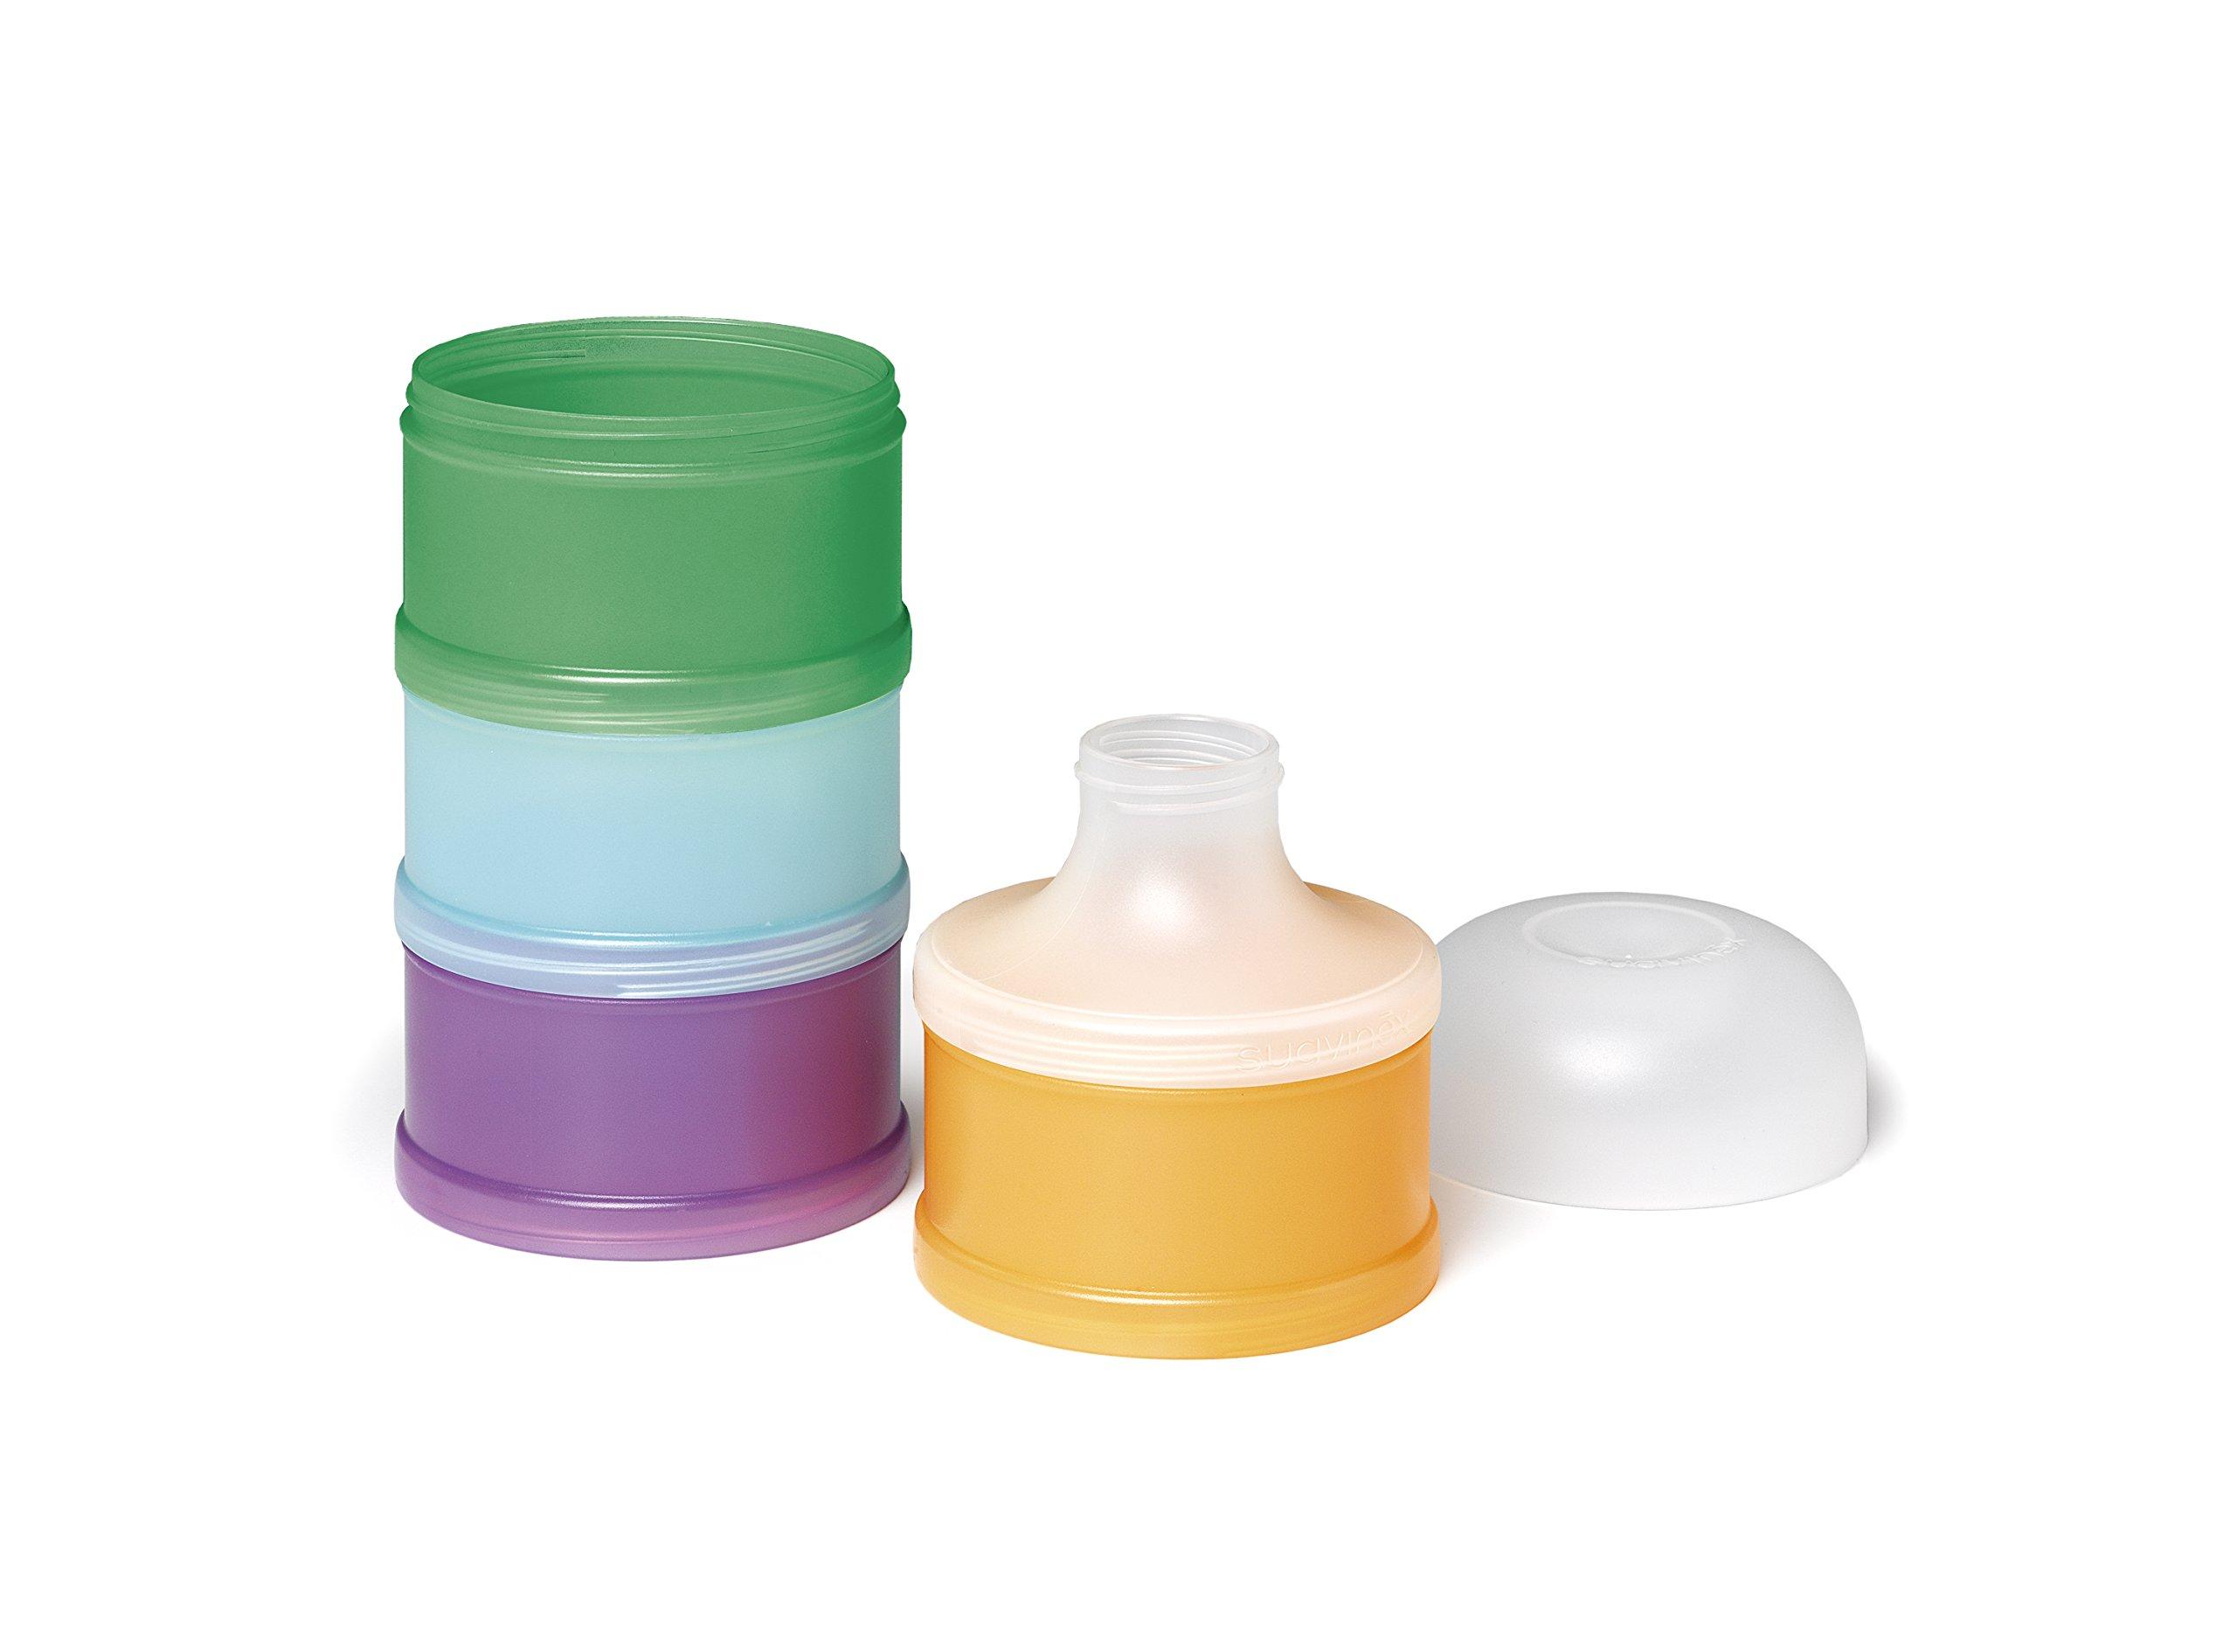 Suavinex 301277 - Dosificador de leche en polvo product image